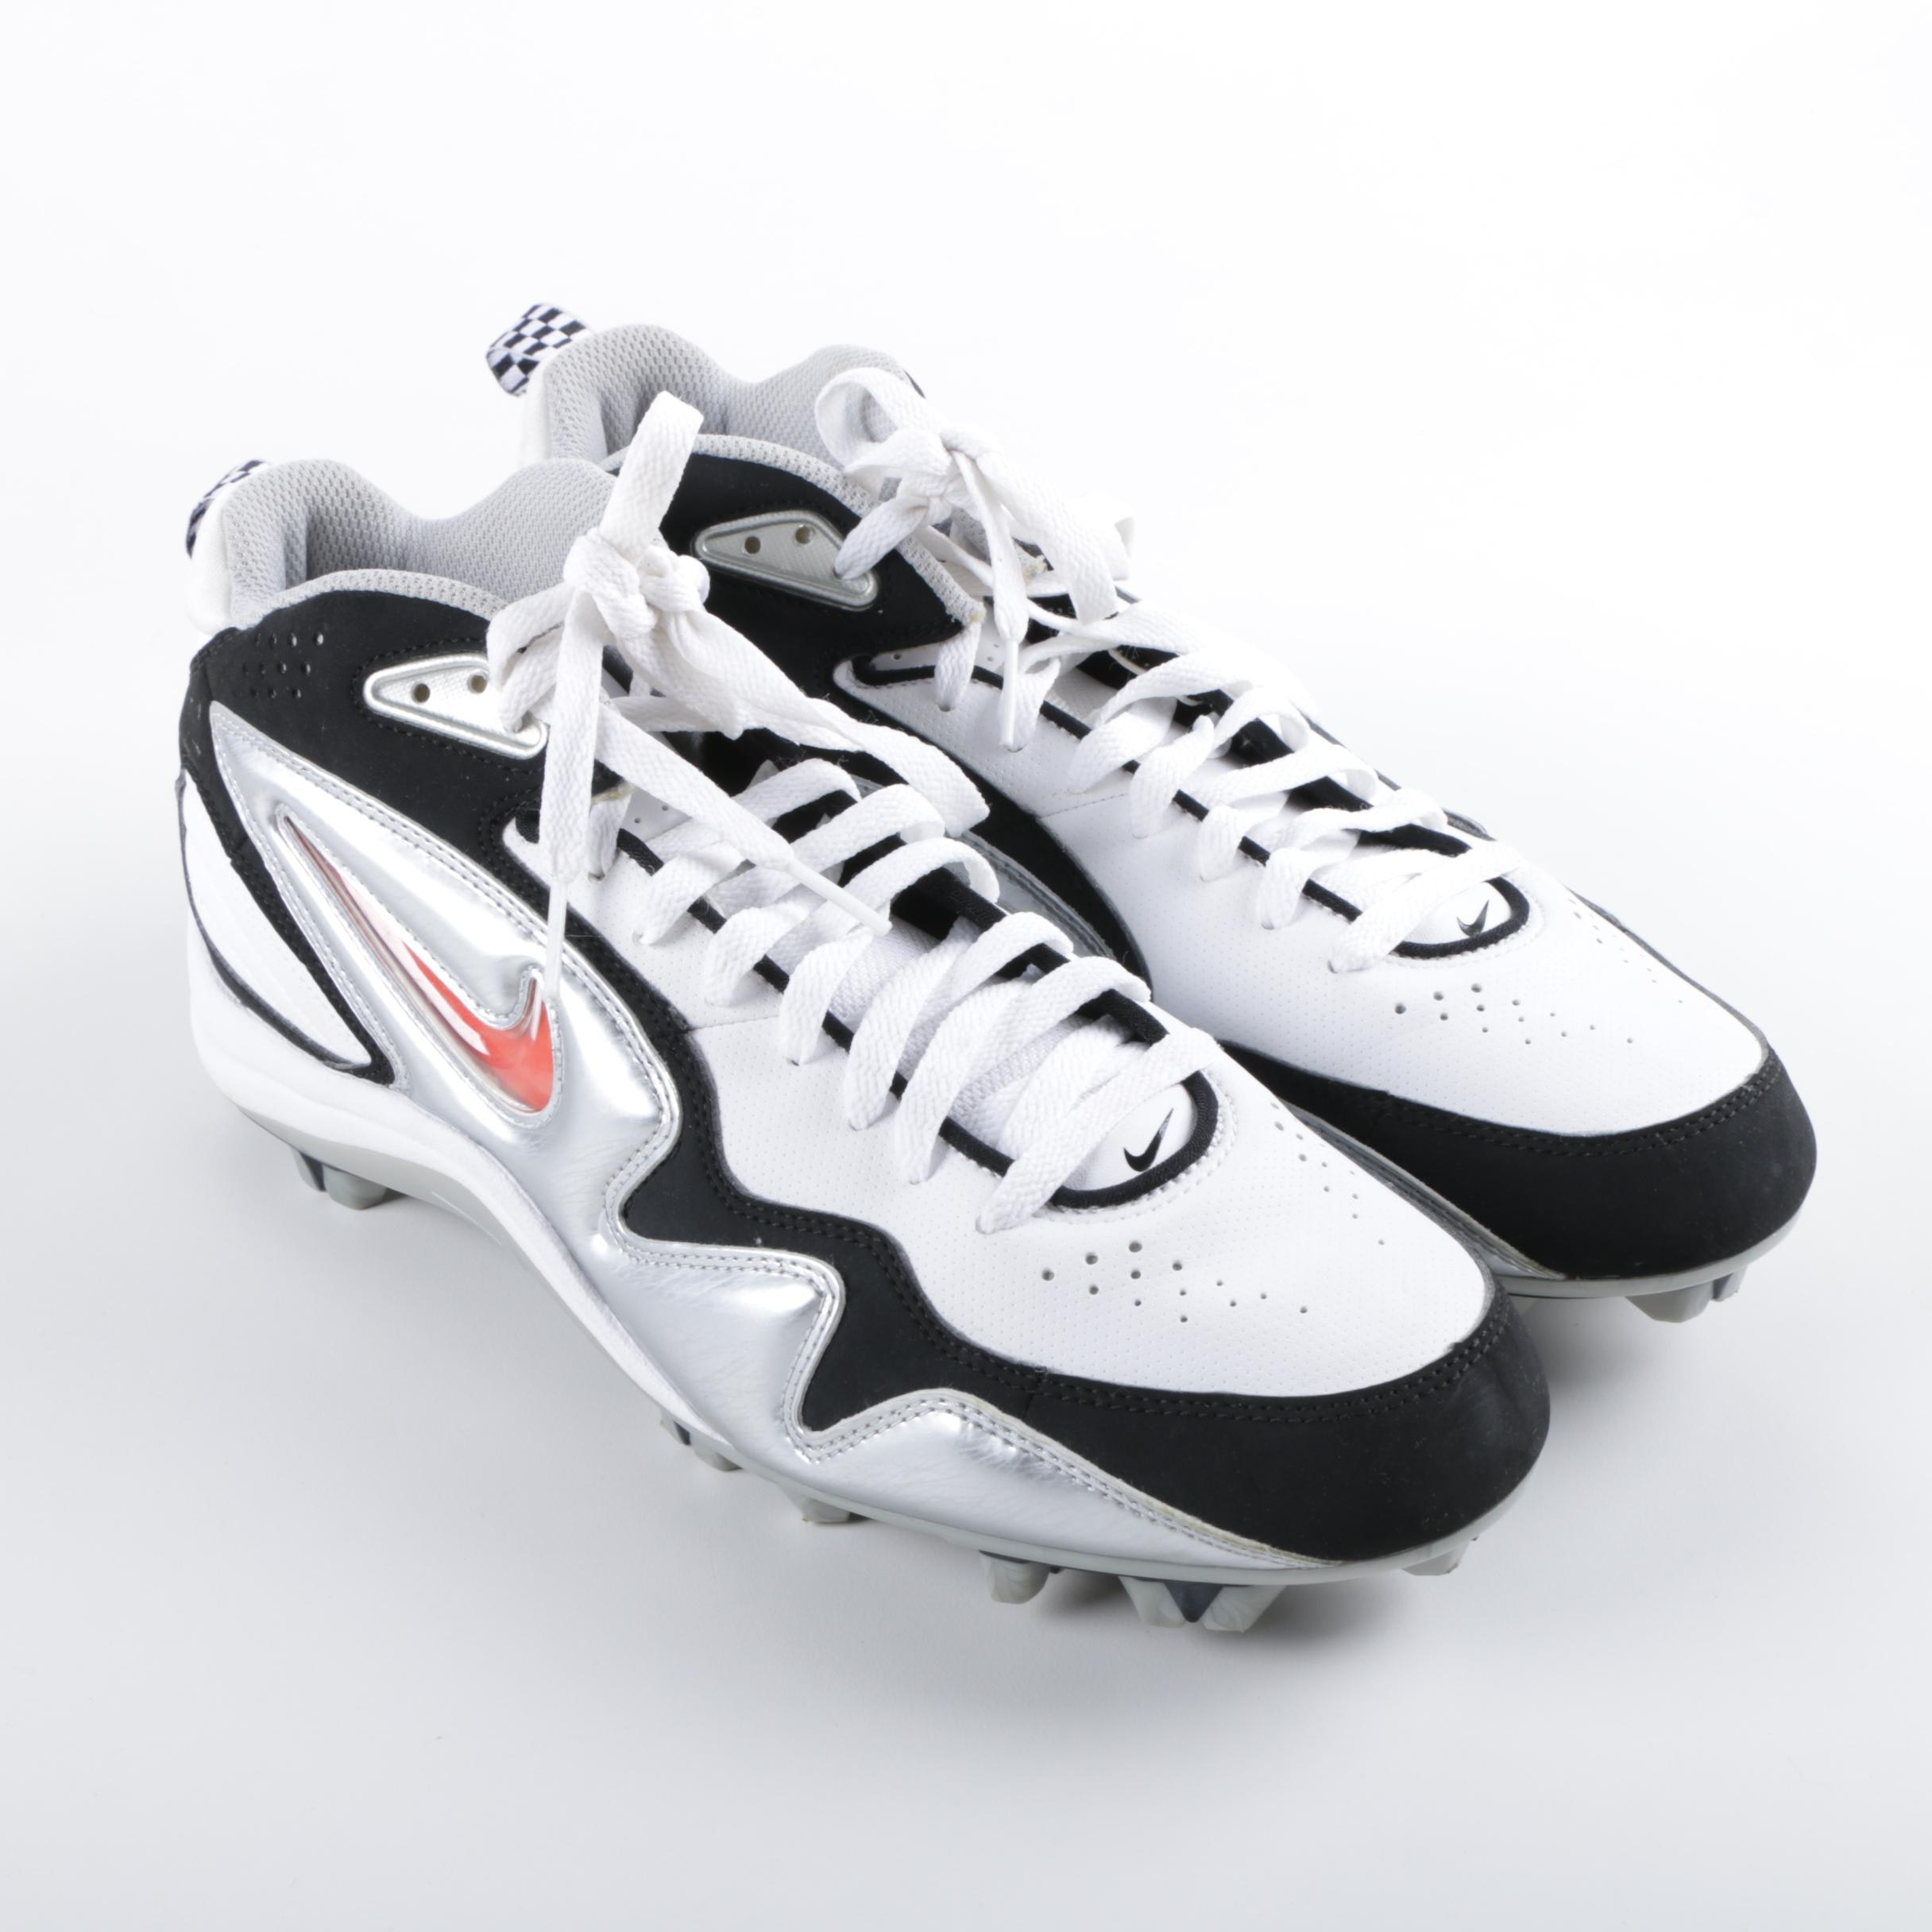 Men's Nike Speedlax II White, Black and Metallic Silver Football Cleats